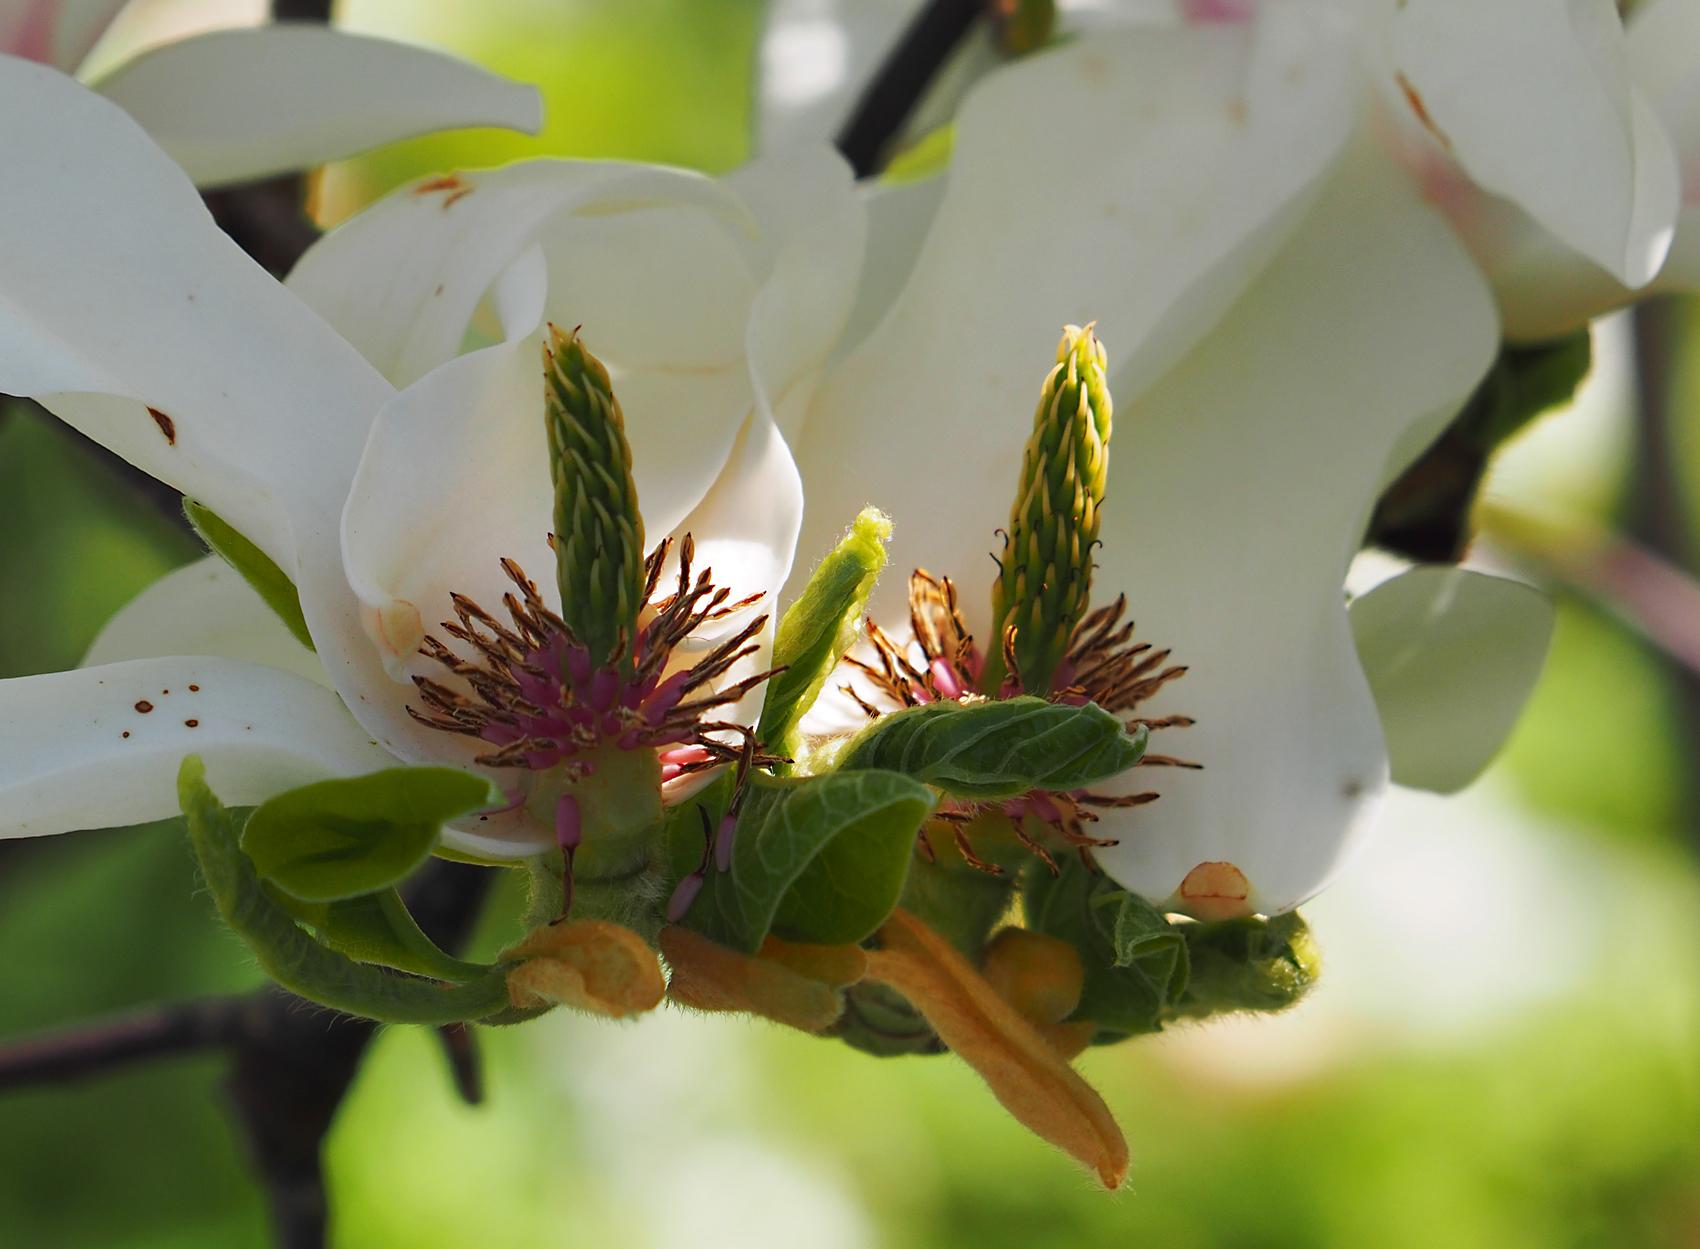 Yulan-Magnolie02 (Magnolia denudata)